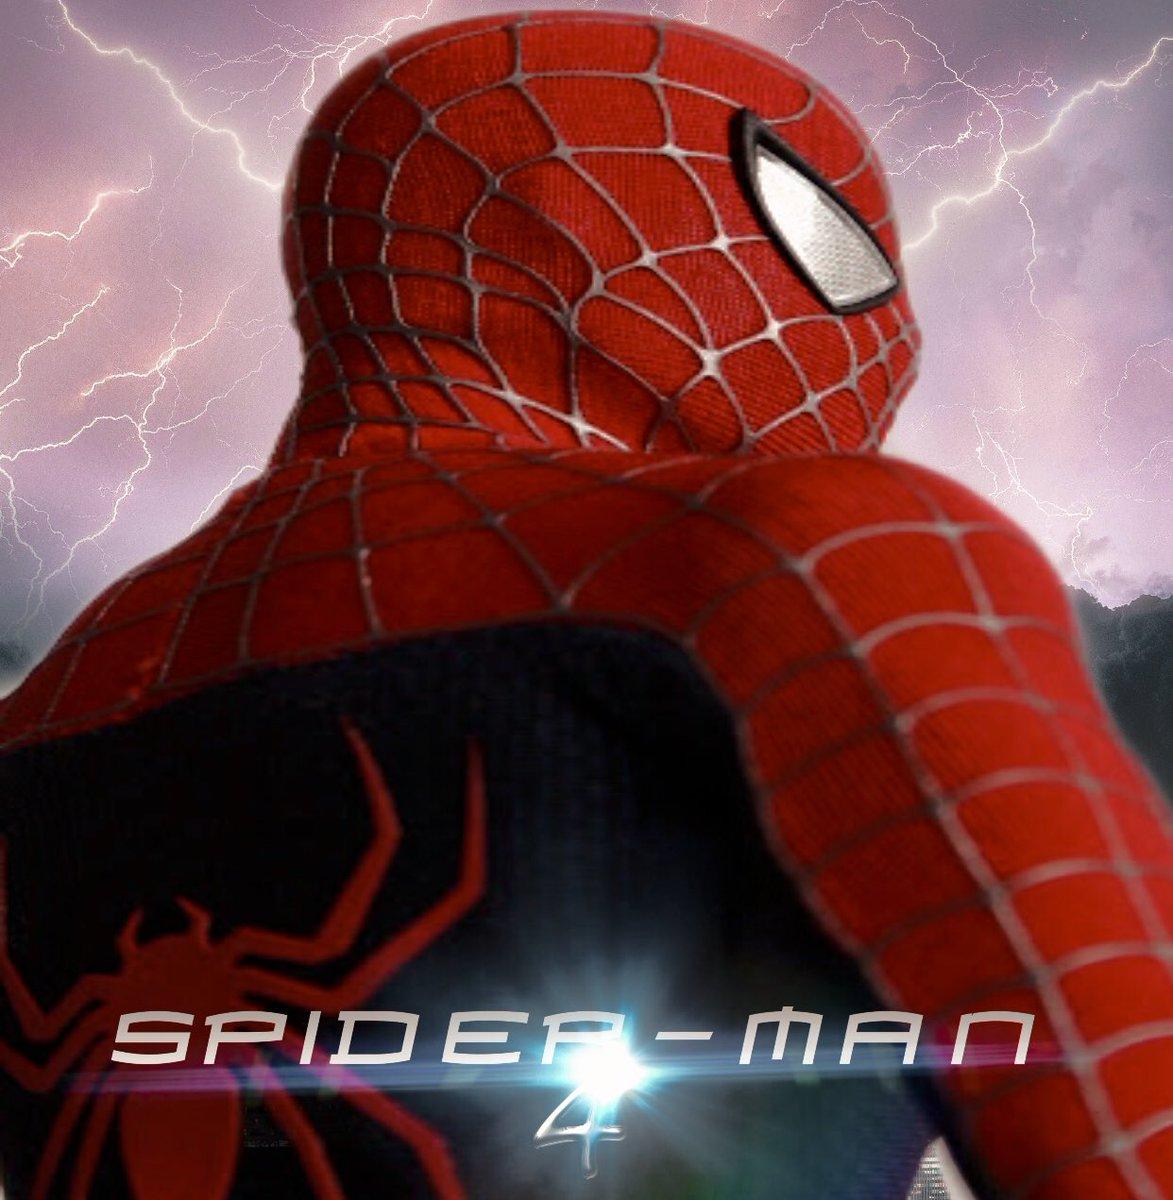 #Spiderman #TobeyMaguire #AndrewGarfield #sony #SpiderMan3 #Disneyland #XboxSeriesS #PlayStation5 #marvel #starwars #lego #MCU #DisneyPlus #MarvelStudios #BlackWidow #Avengers #MilesMorales #MoonKnight #Deadpool3